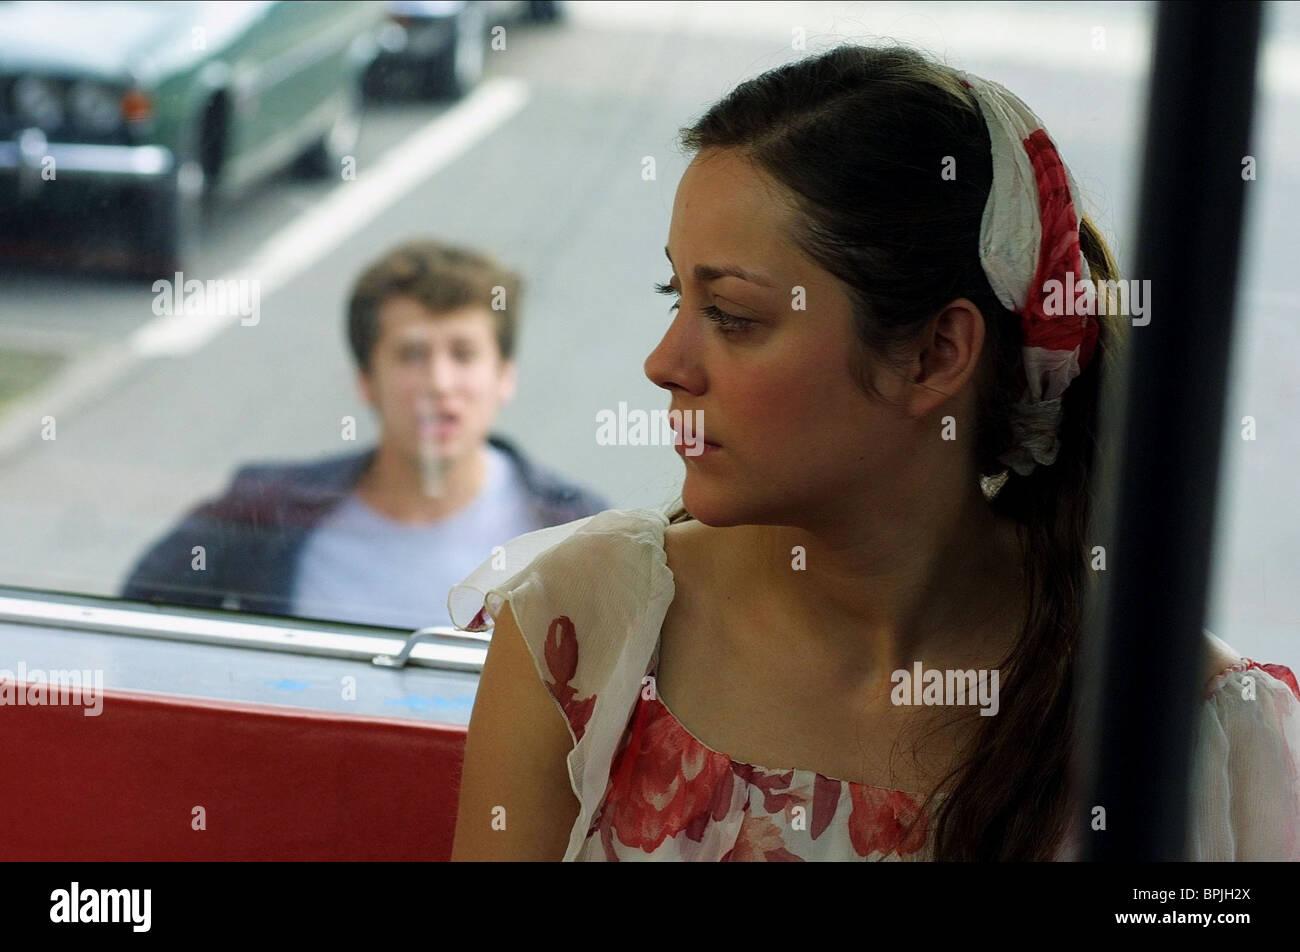 GUILLAUME CANET & MARION COTILLARD JEUX D'ENFANTS; LOVE ME IF YOU DARE (2003) - Stock Image